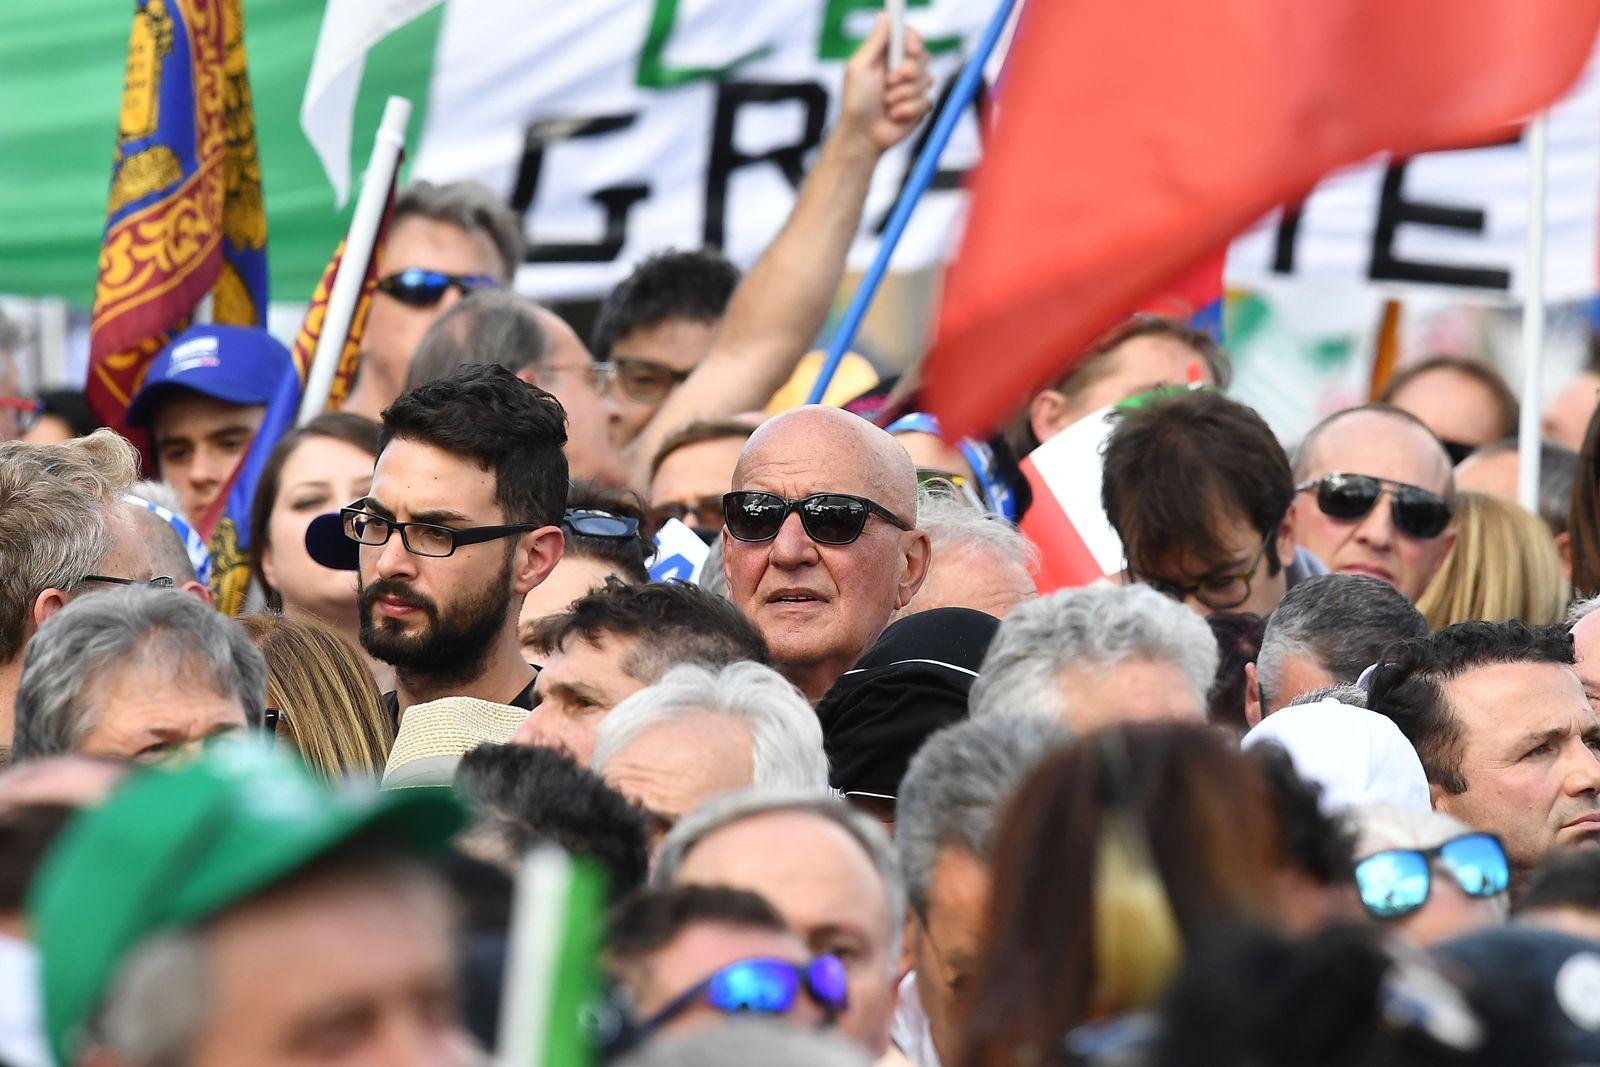 ITALY-POLITICS-PARTIES-LEAGUE-RALLY